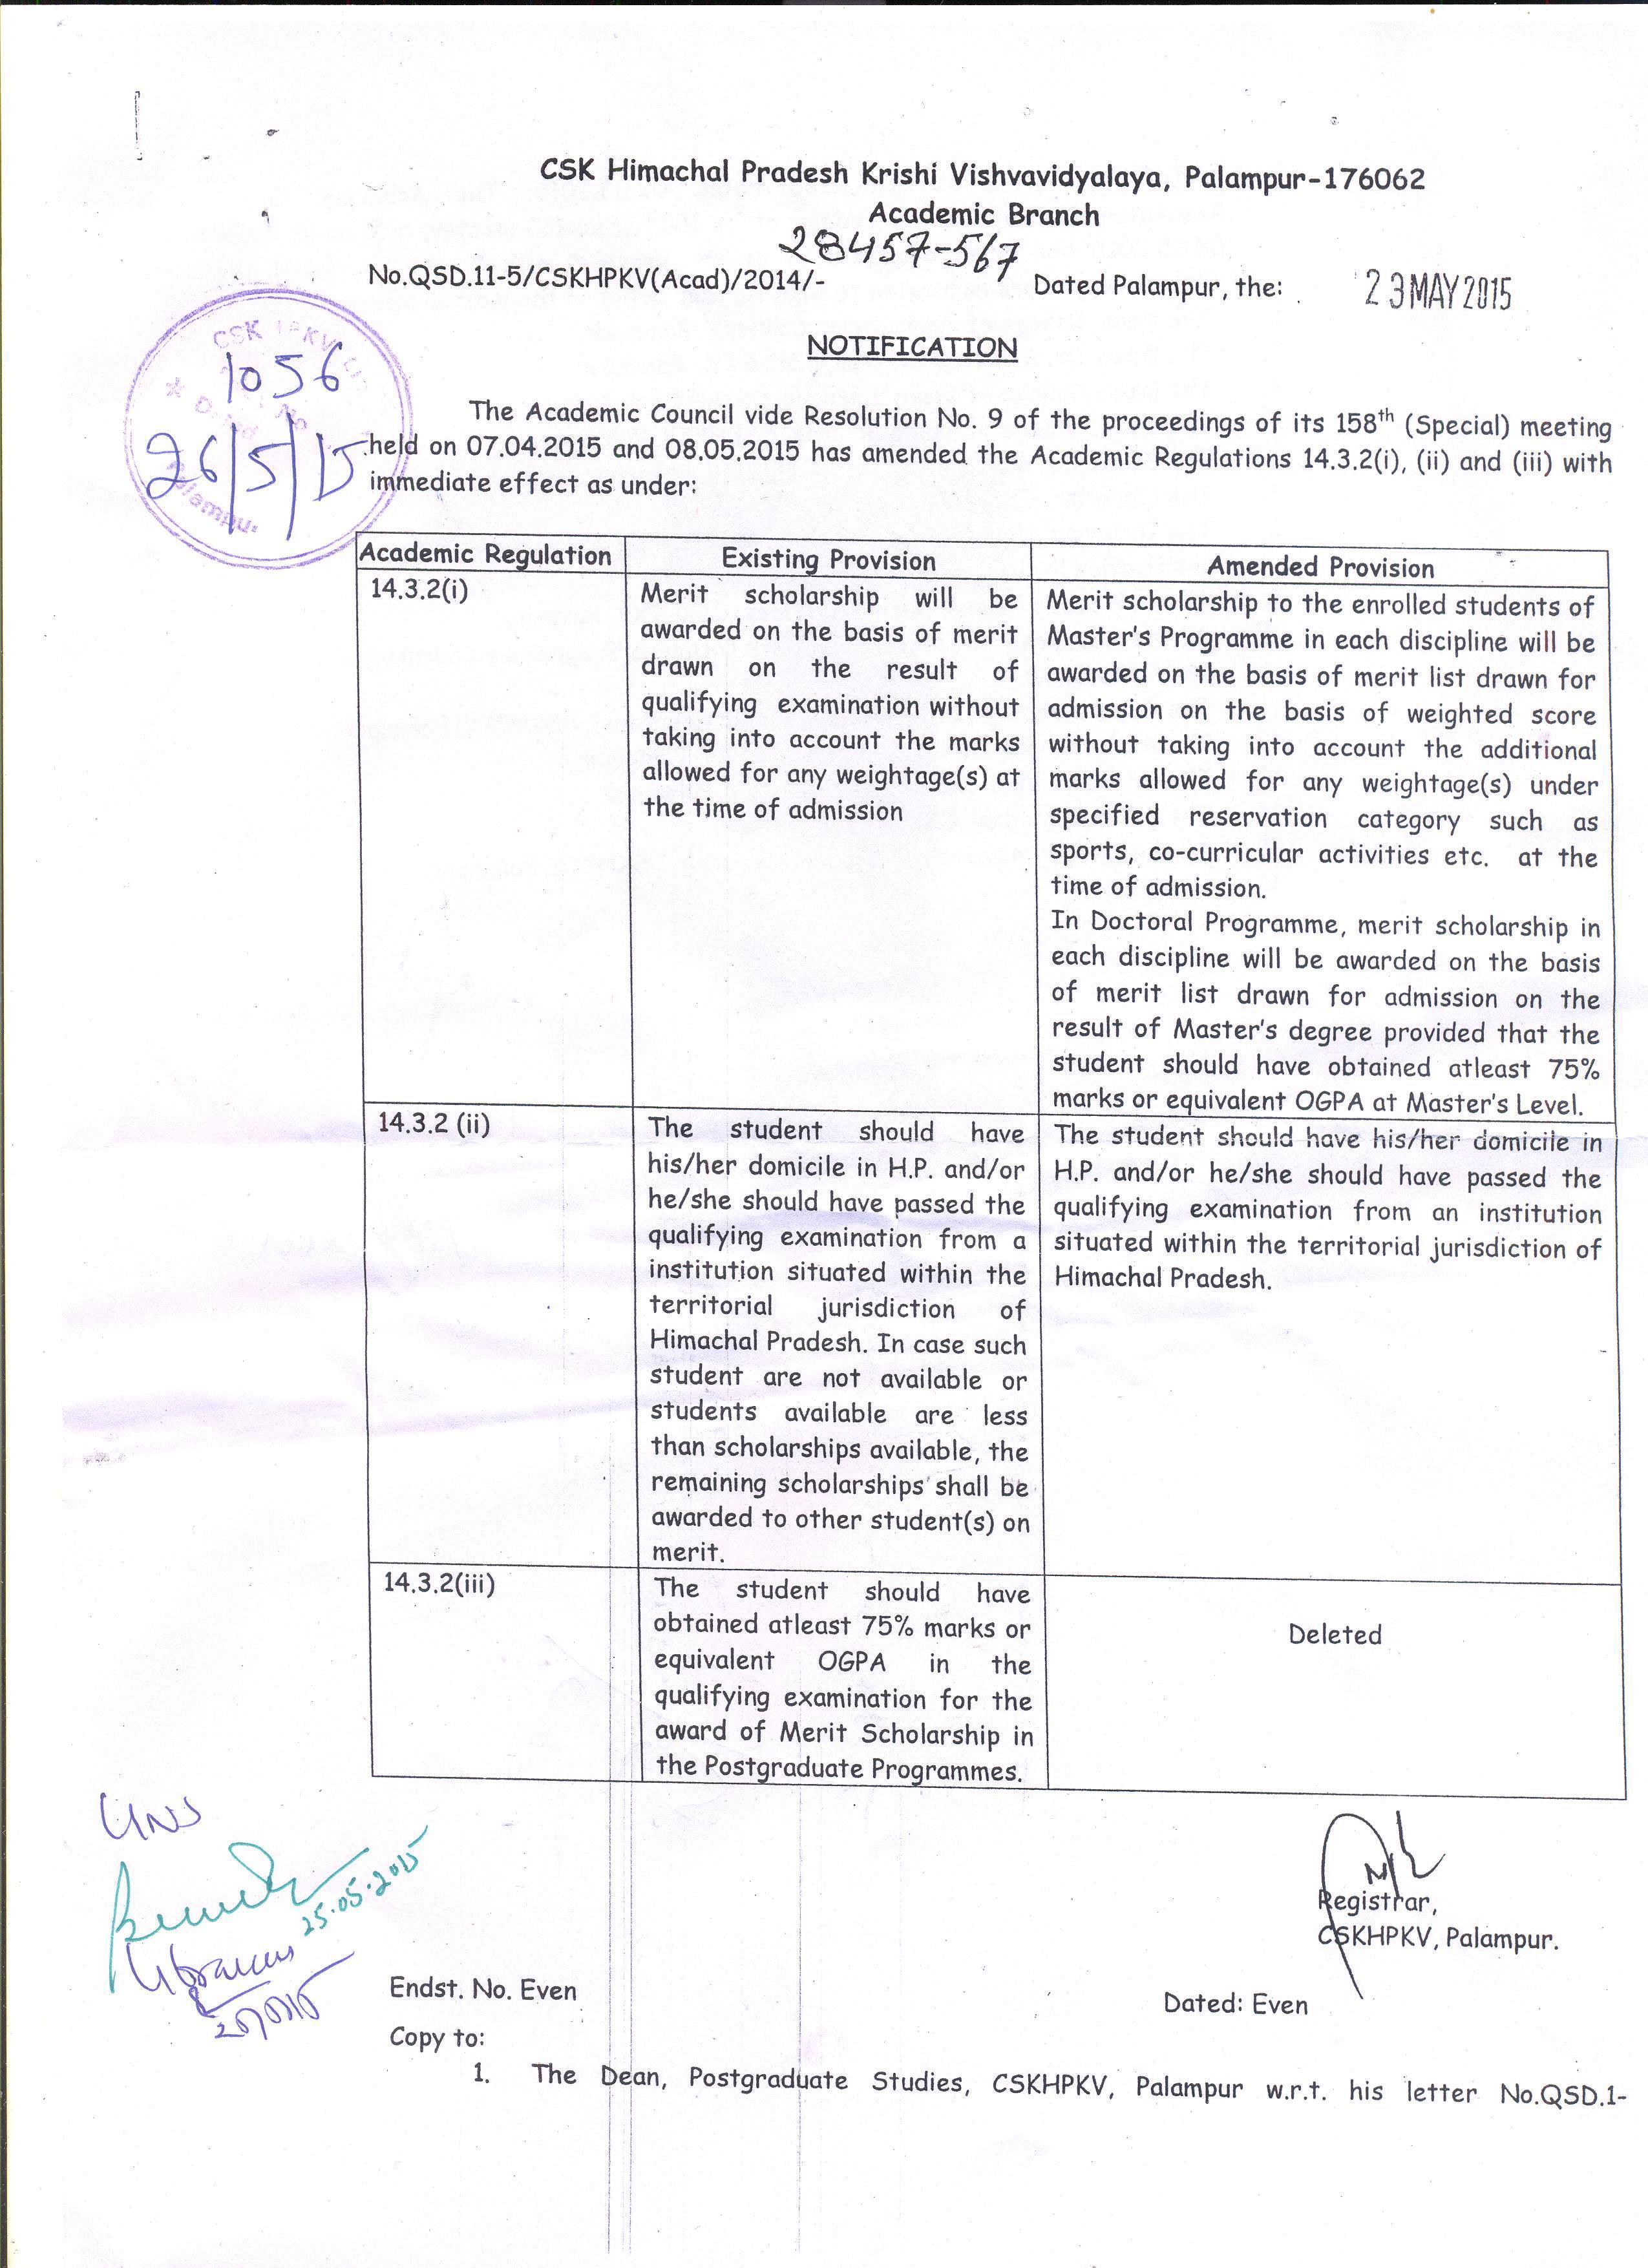 Academic Regulations, CSK HPKV, Palampur